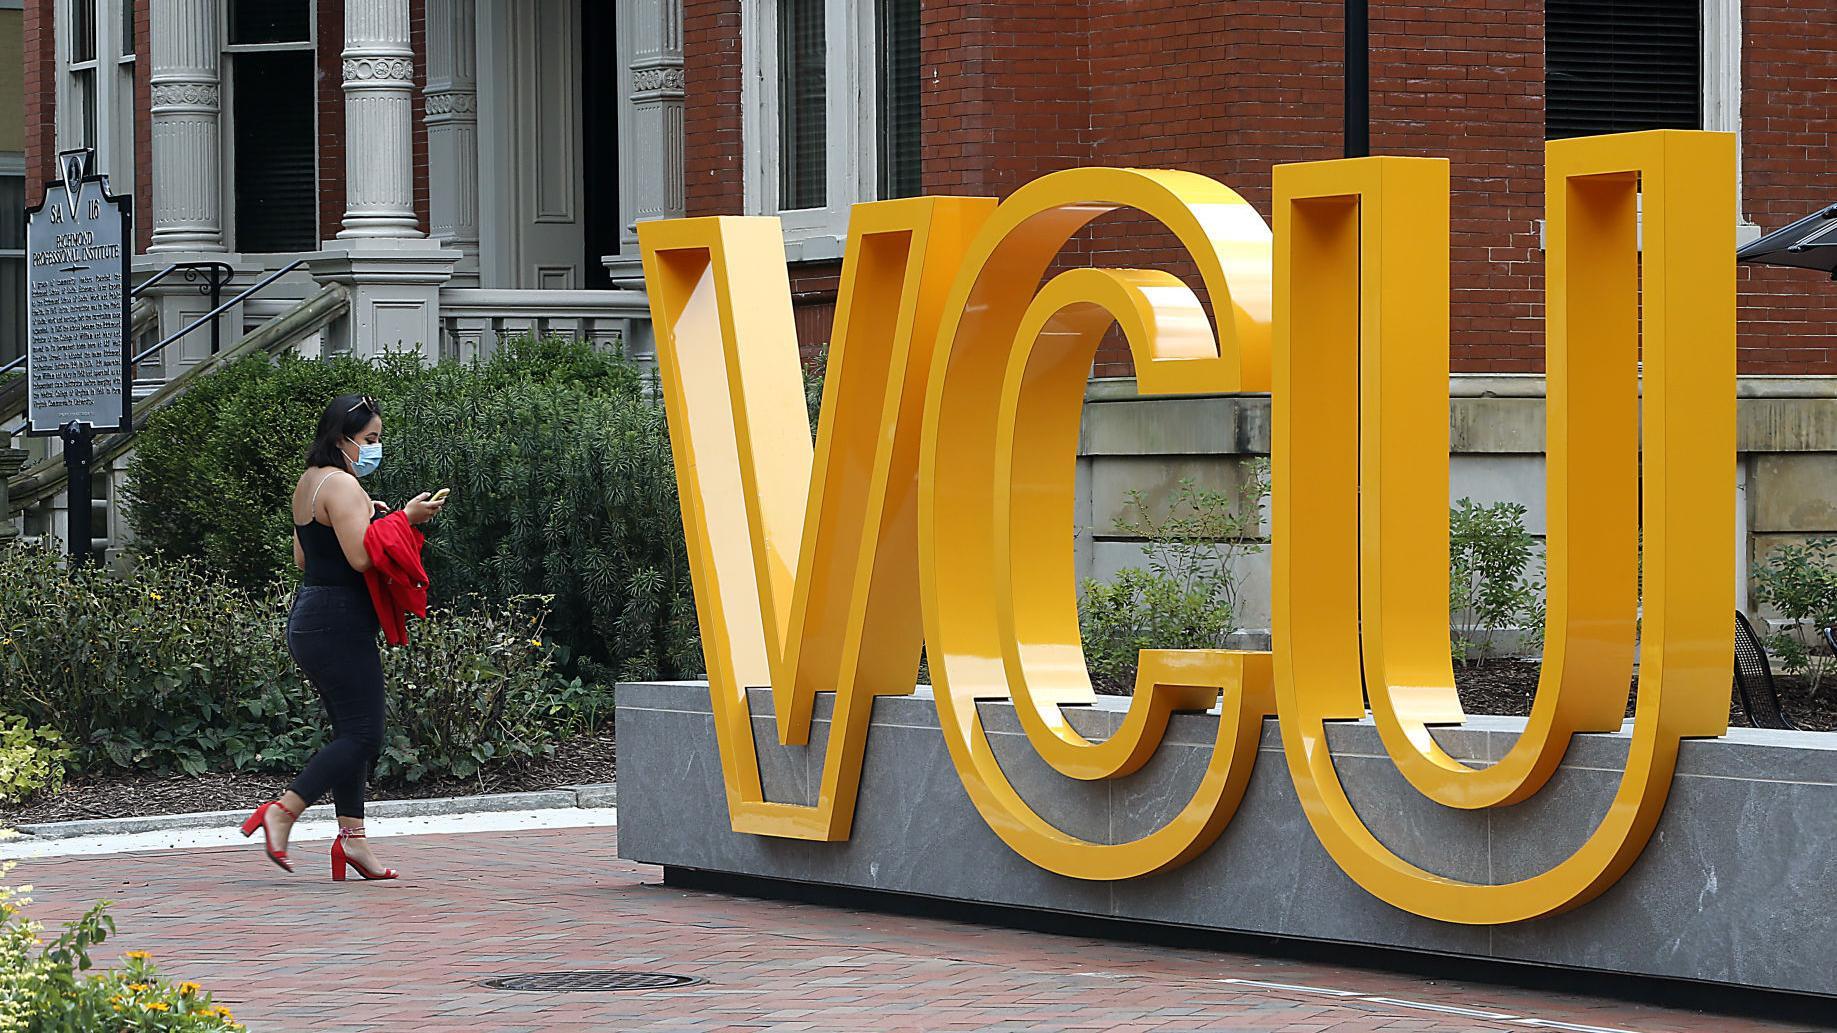 Vcu Calendar 2022.Vcu Administrators Propose Keeping Tuition Flat Next Year Education Richmond Com